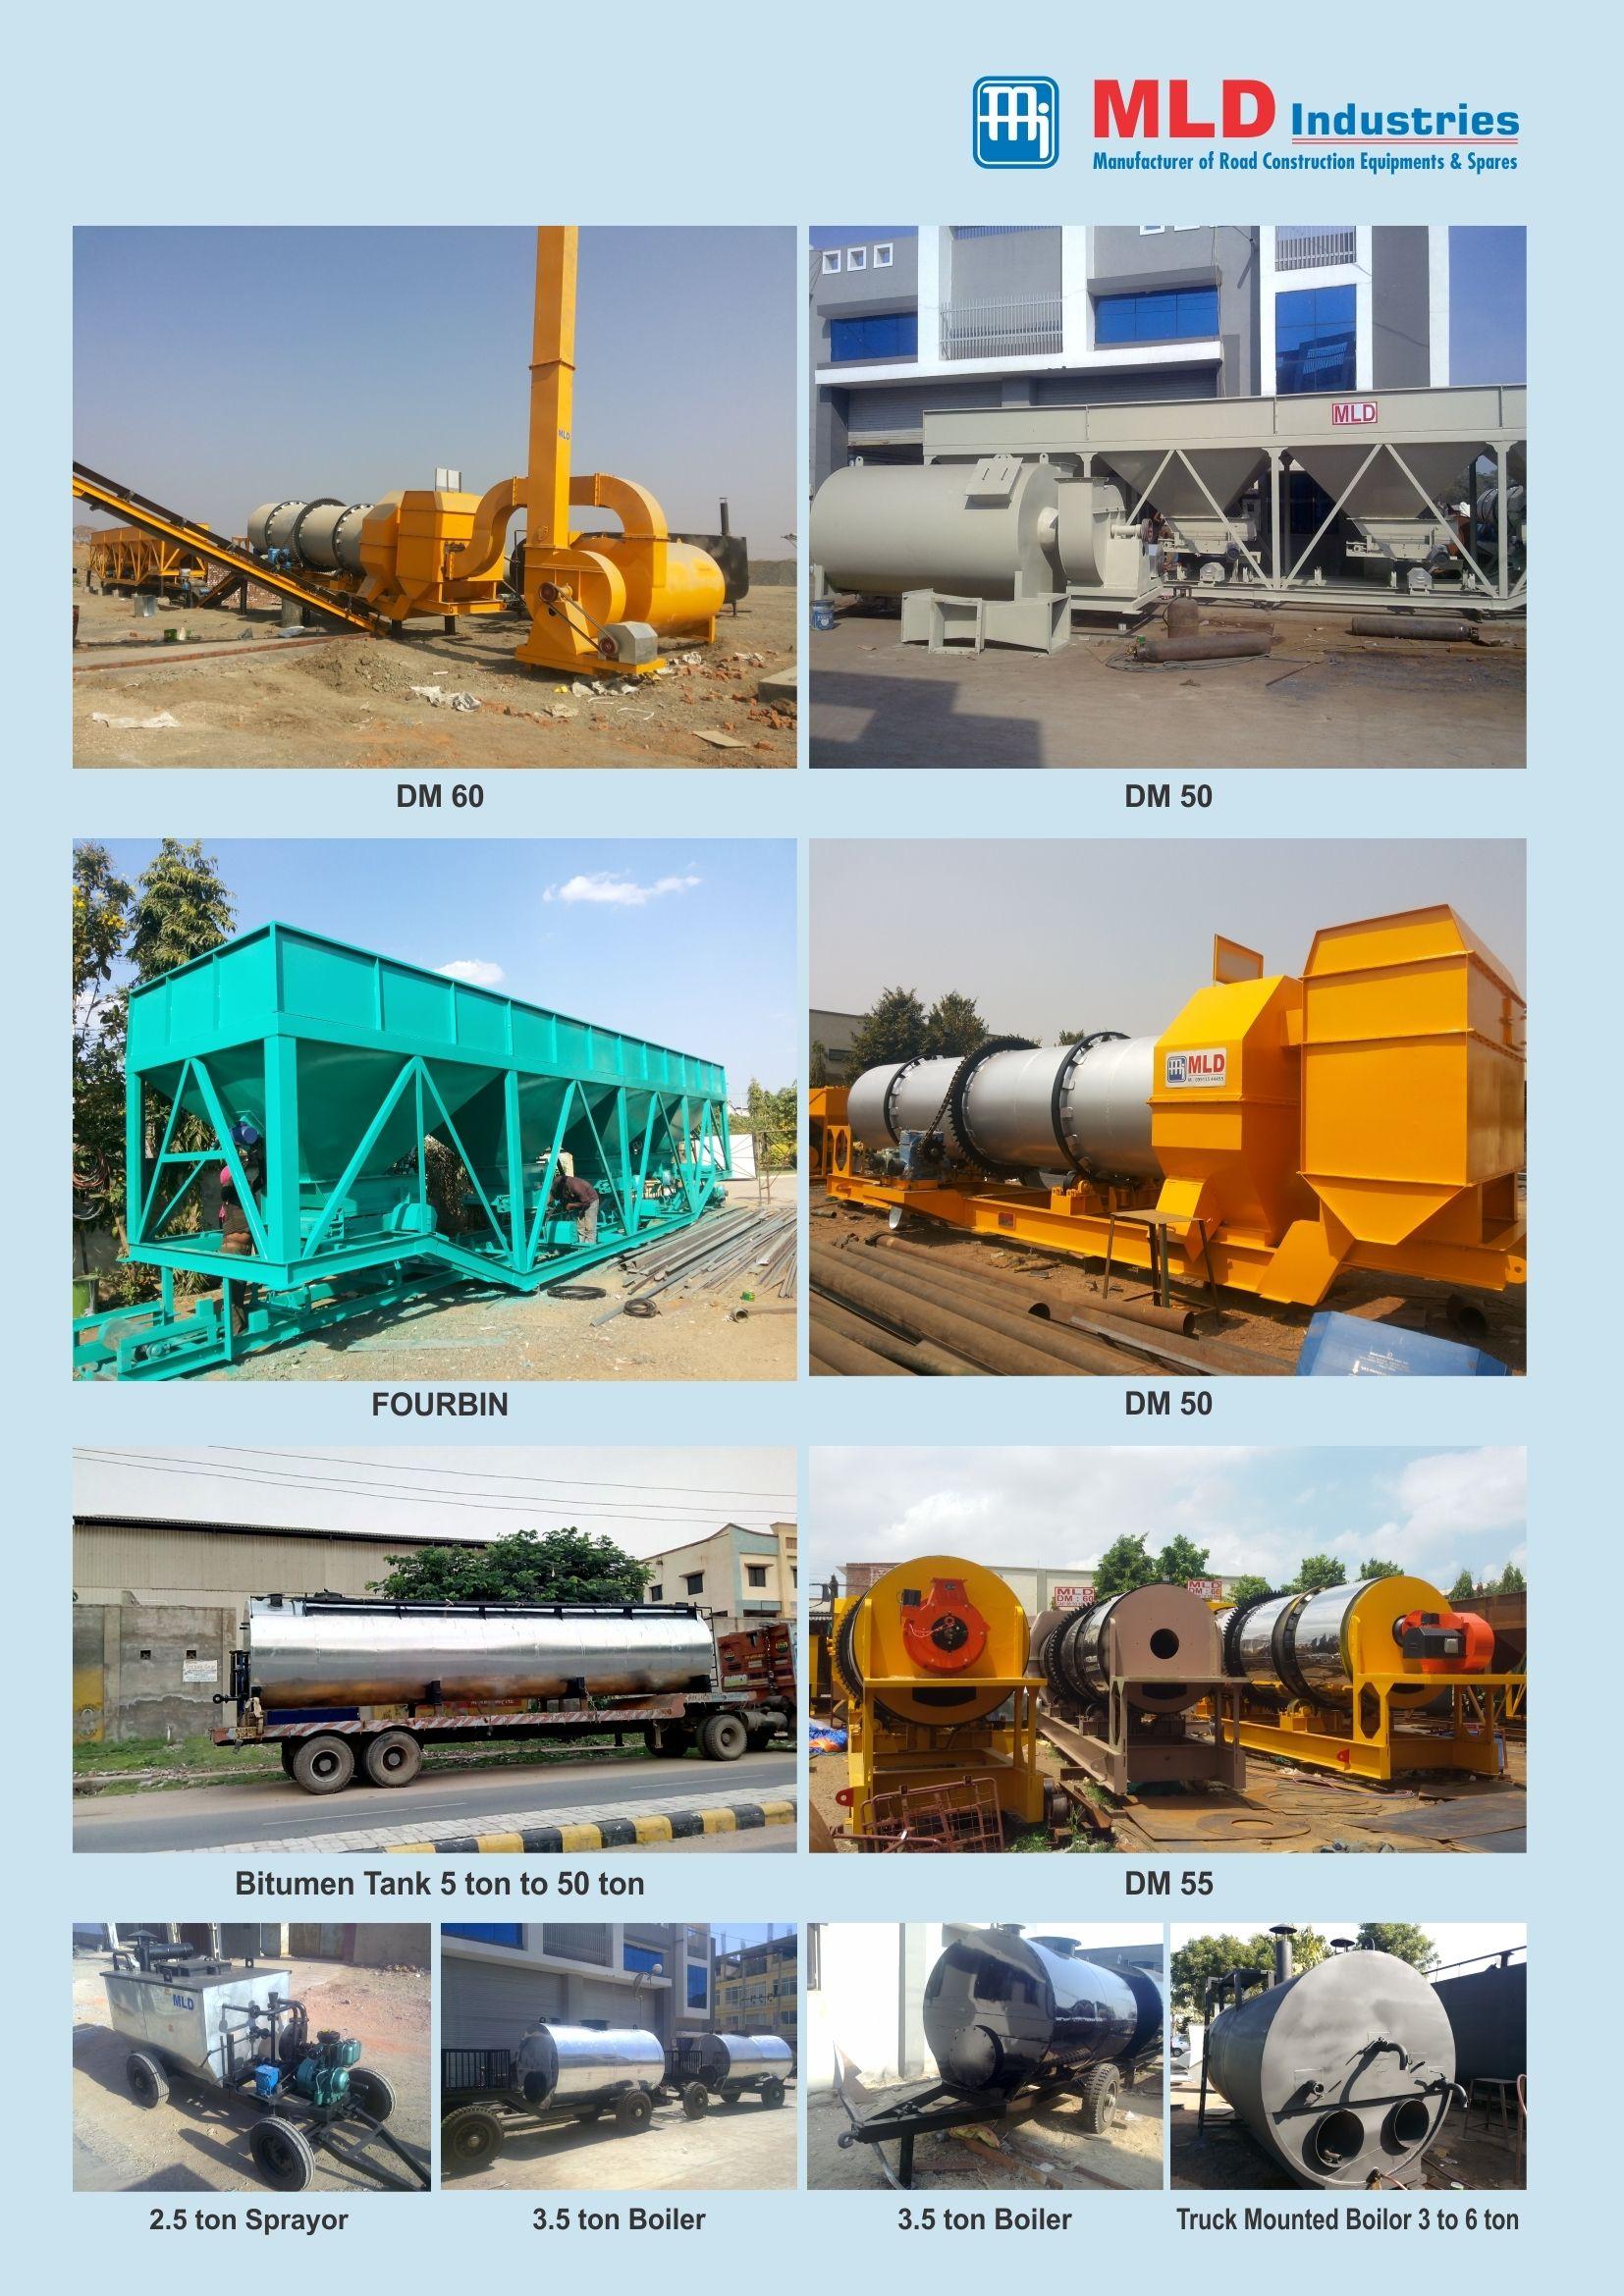 Mld Industries